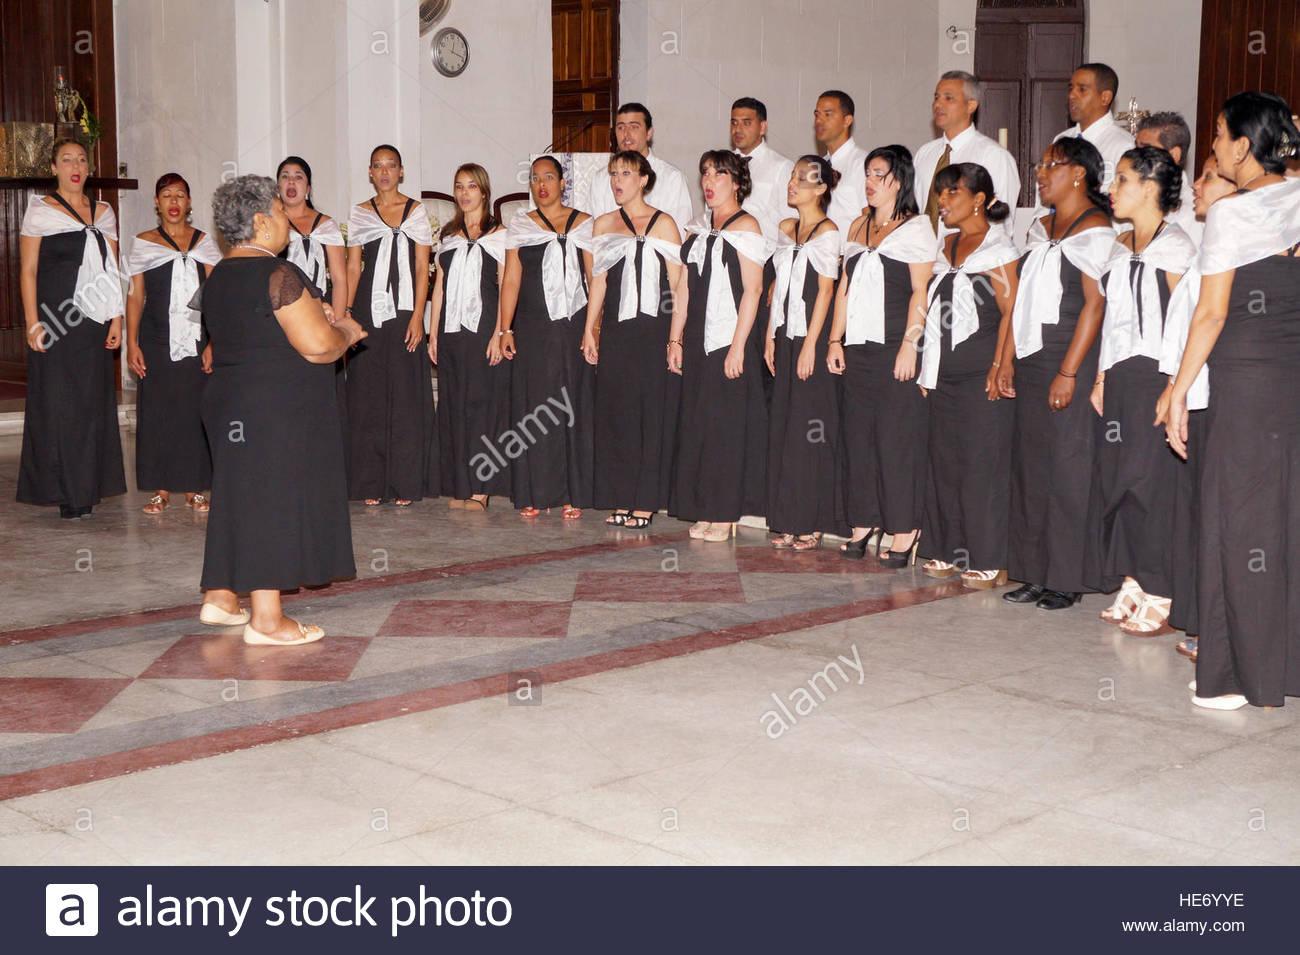 Catholic musical choir in church. Elderly woman directing ...